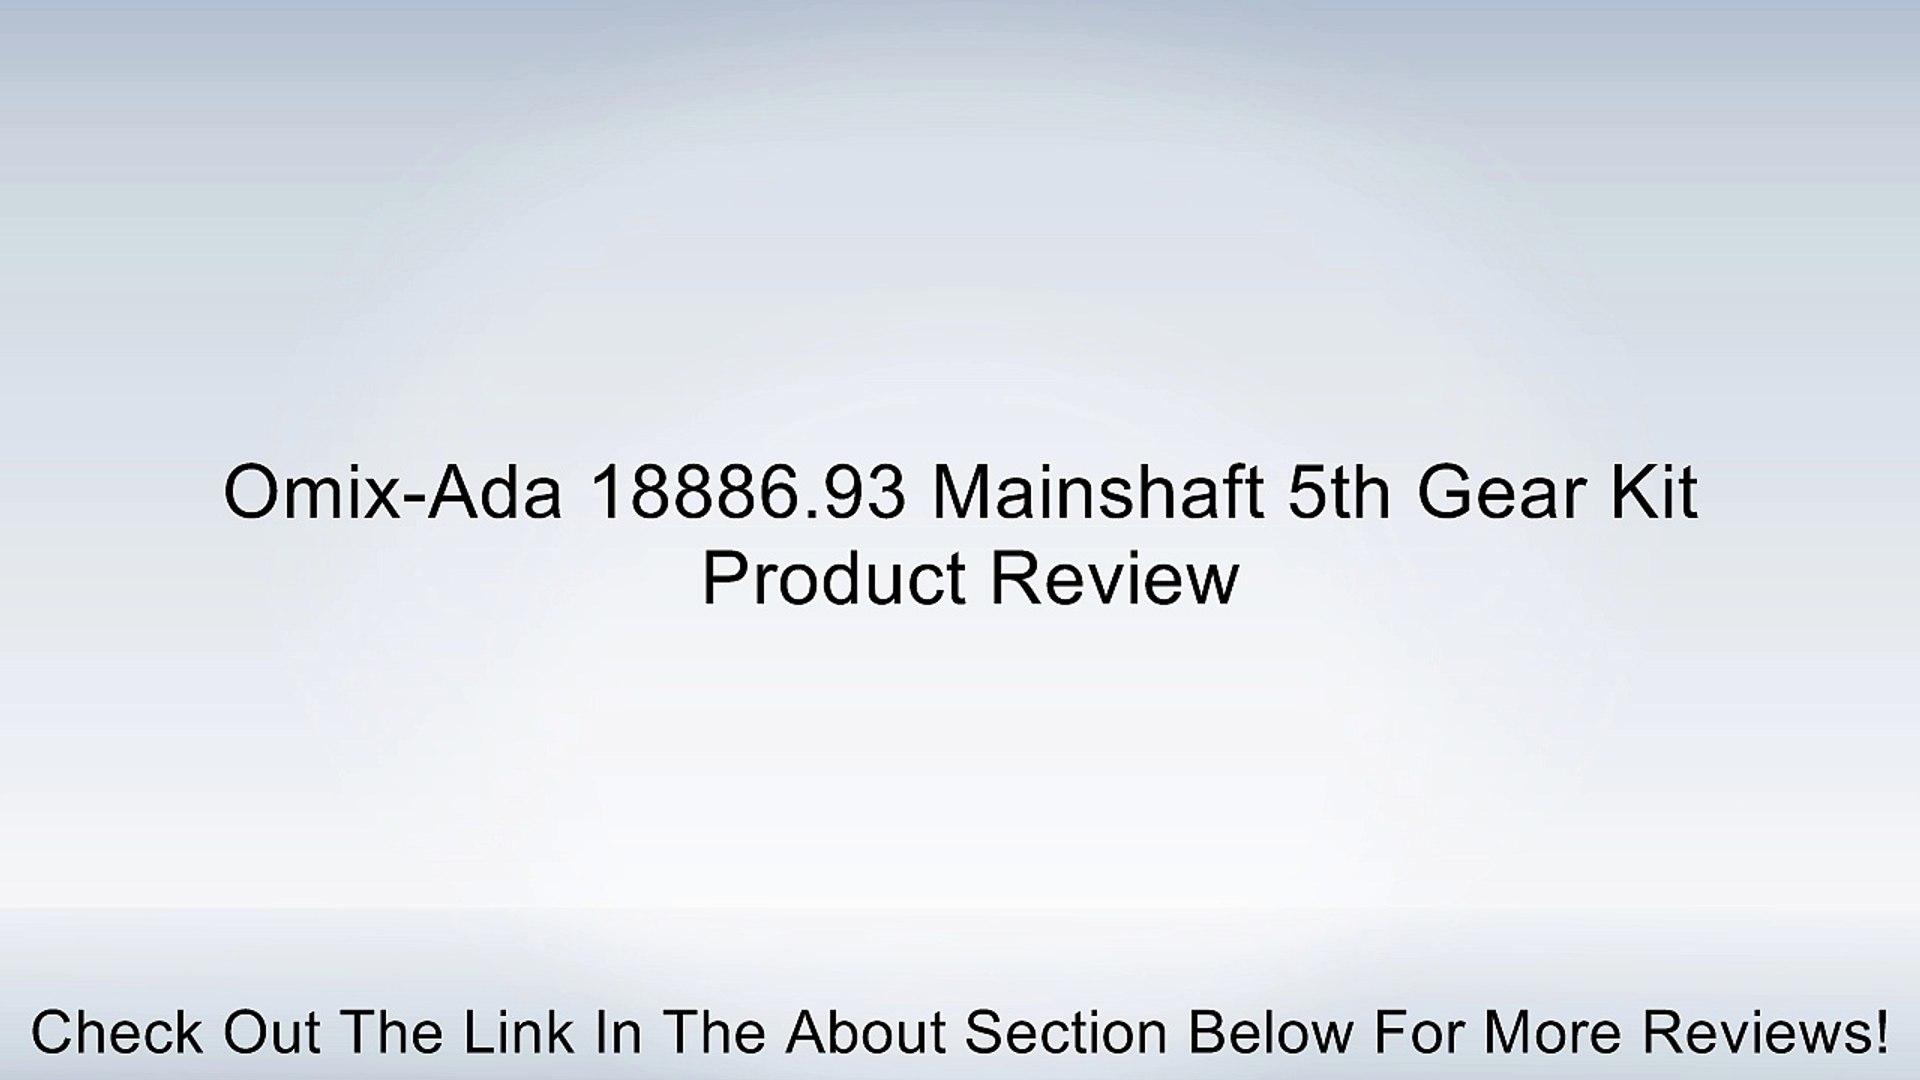 Omix-Ada 18886.93 Mainshaft 5th Gear Kit